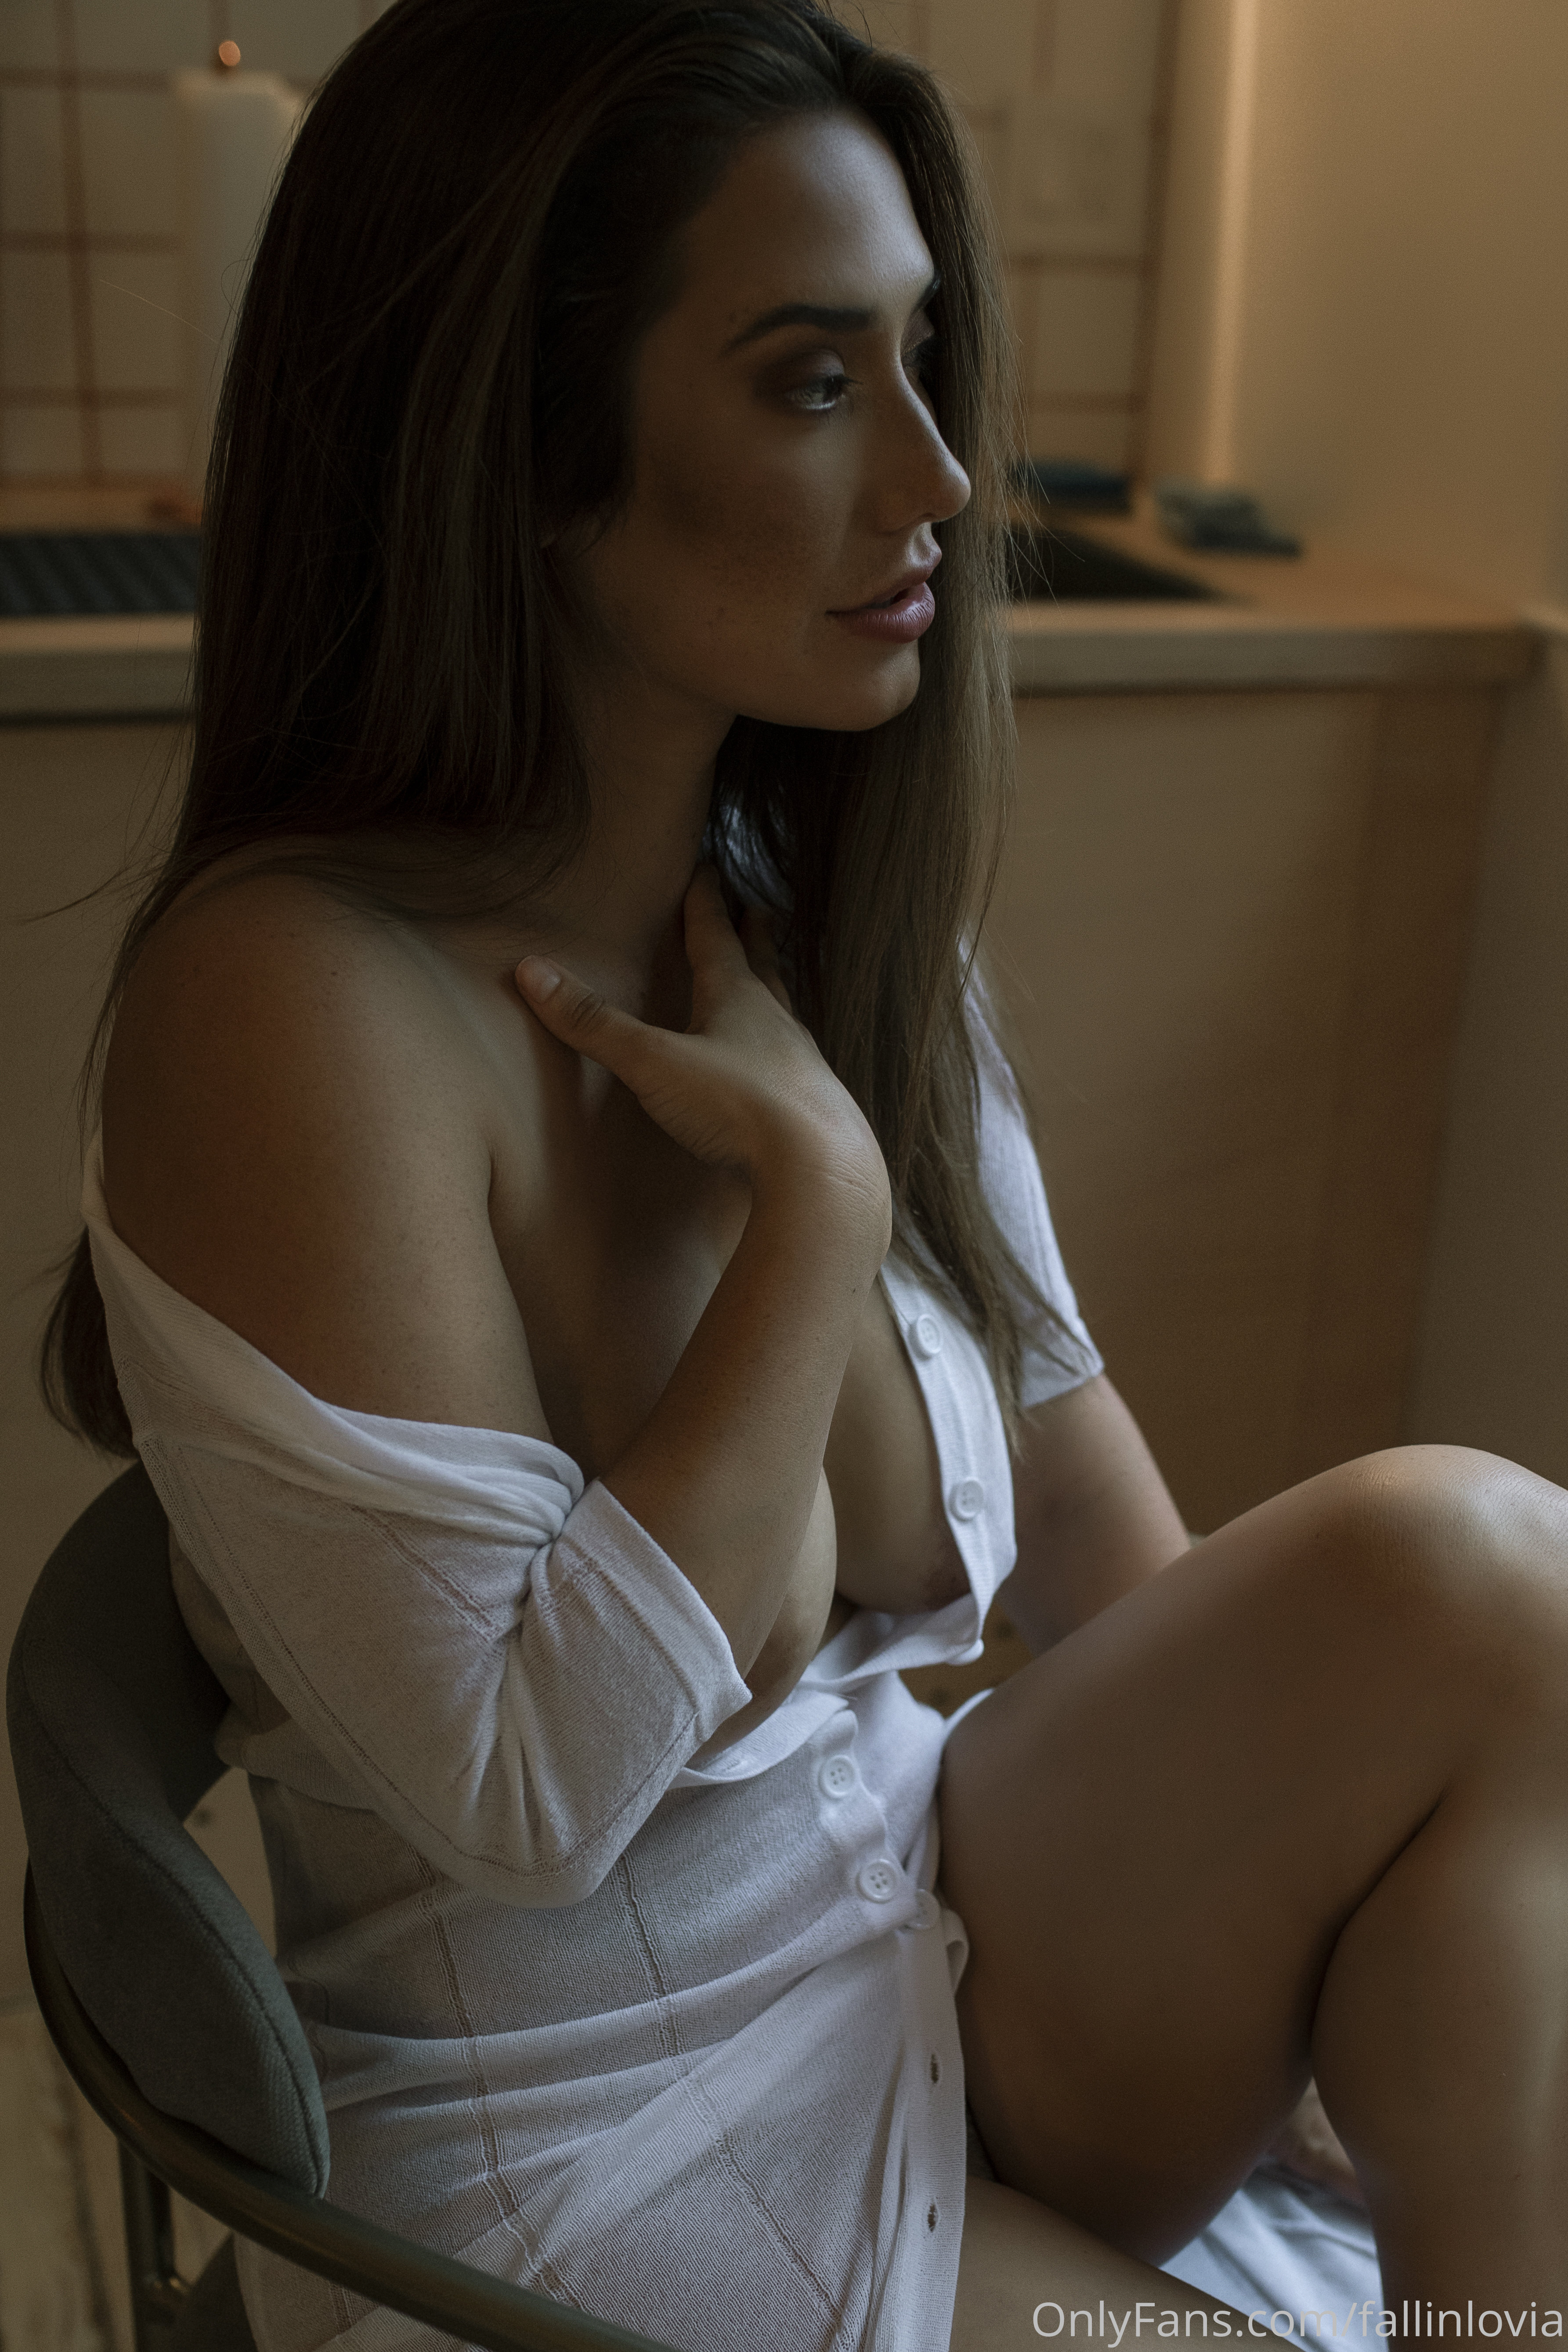 Eva Lovia, Fallinlovia, Onlyfans 0199